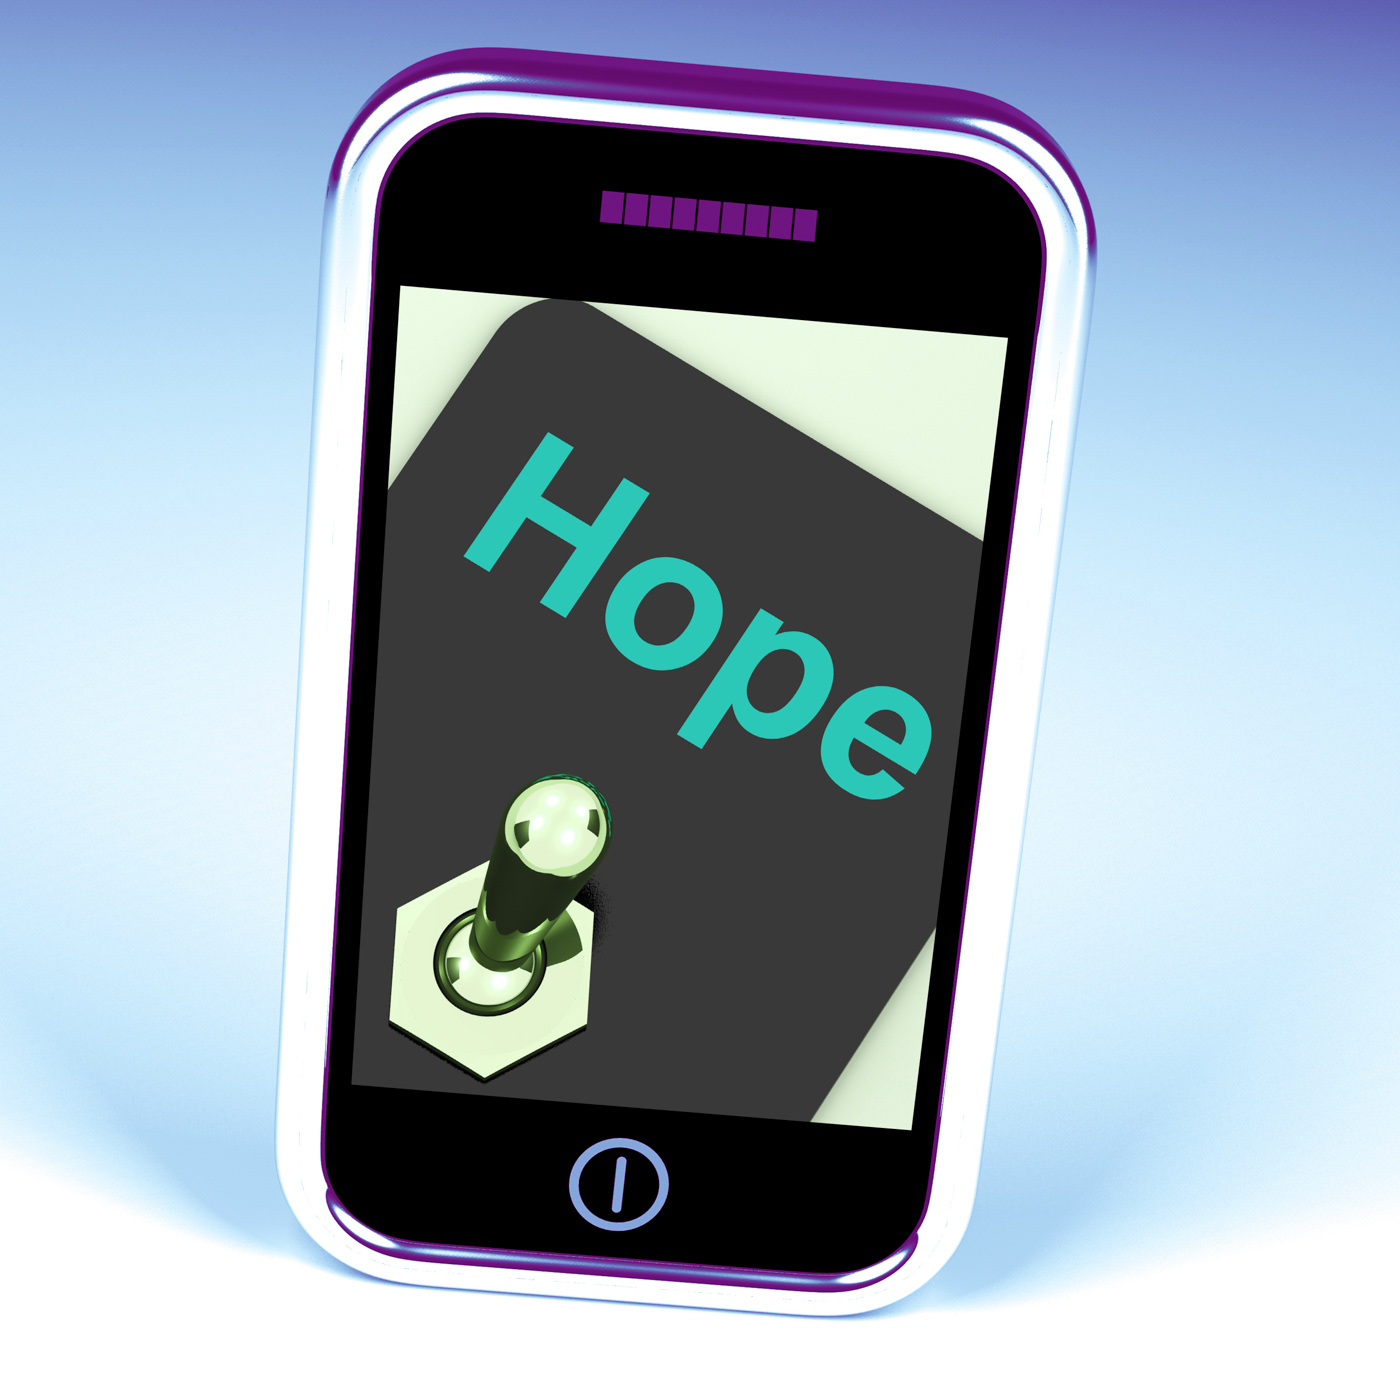 Hope Switch Phone Shows Wishing Hoping Wanting, Faith, Wishing, Wishful, Wishes, HQ Photo